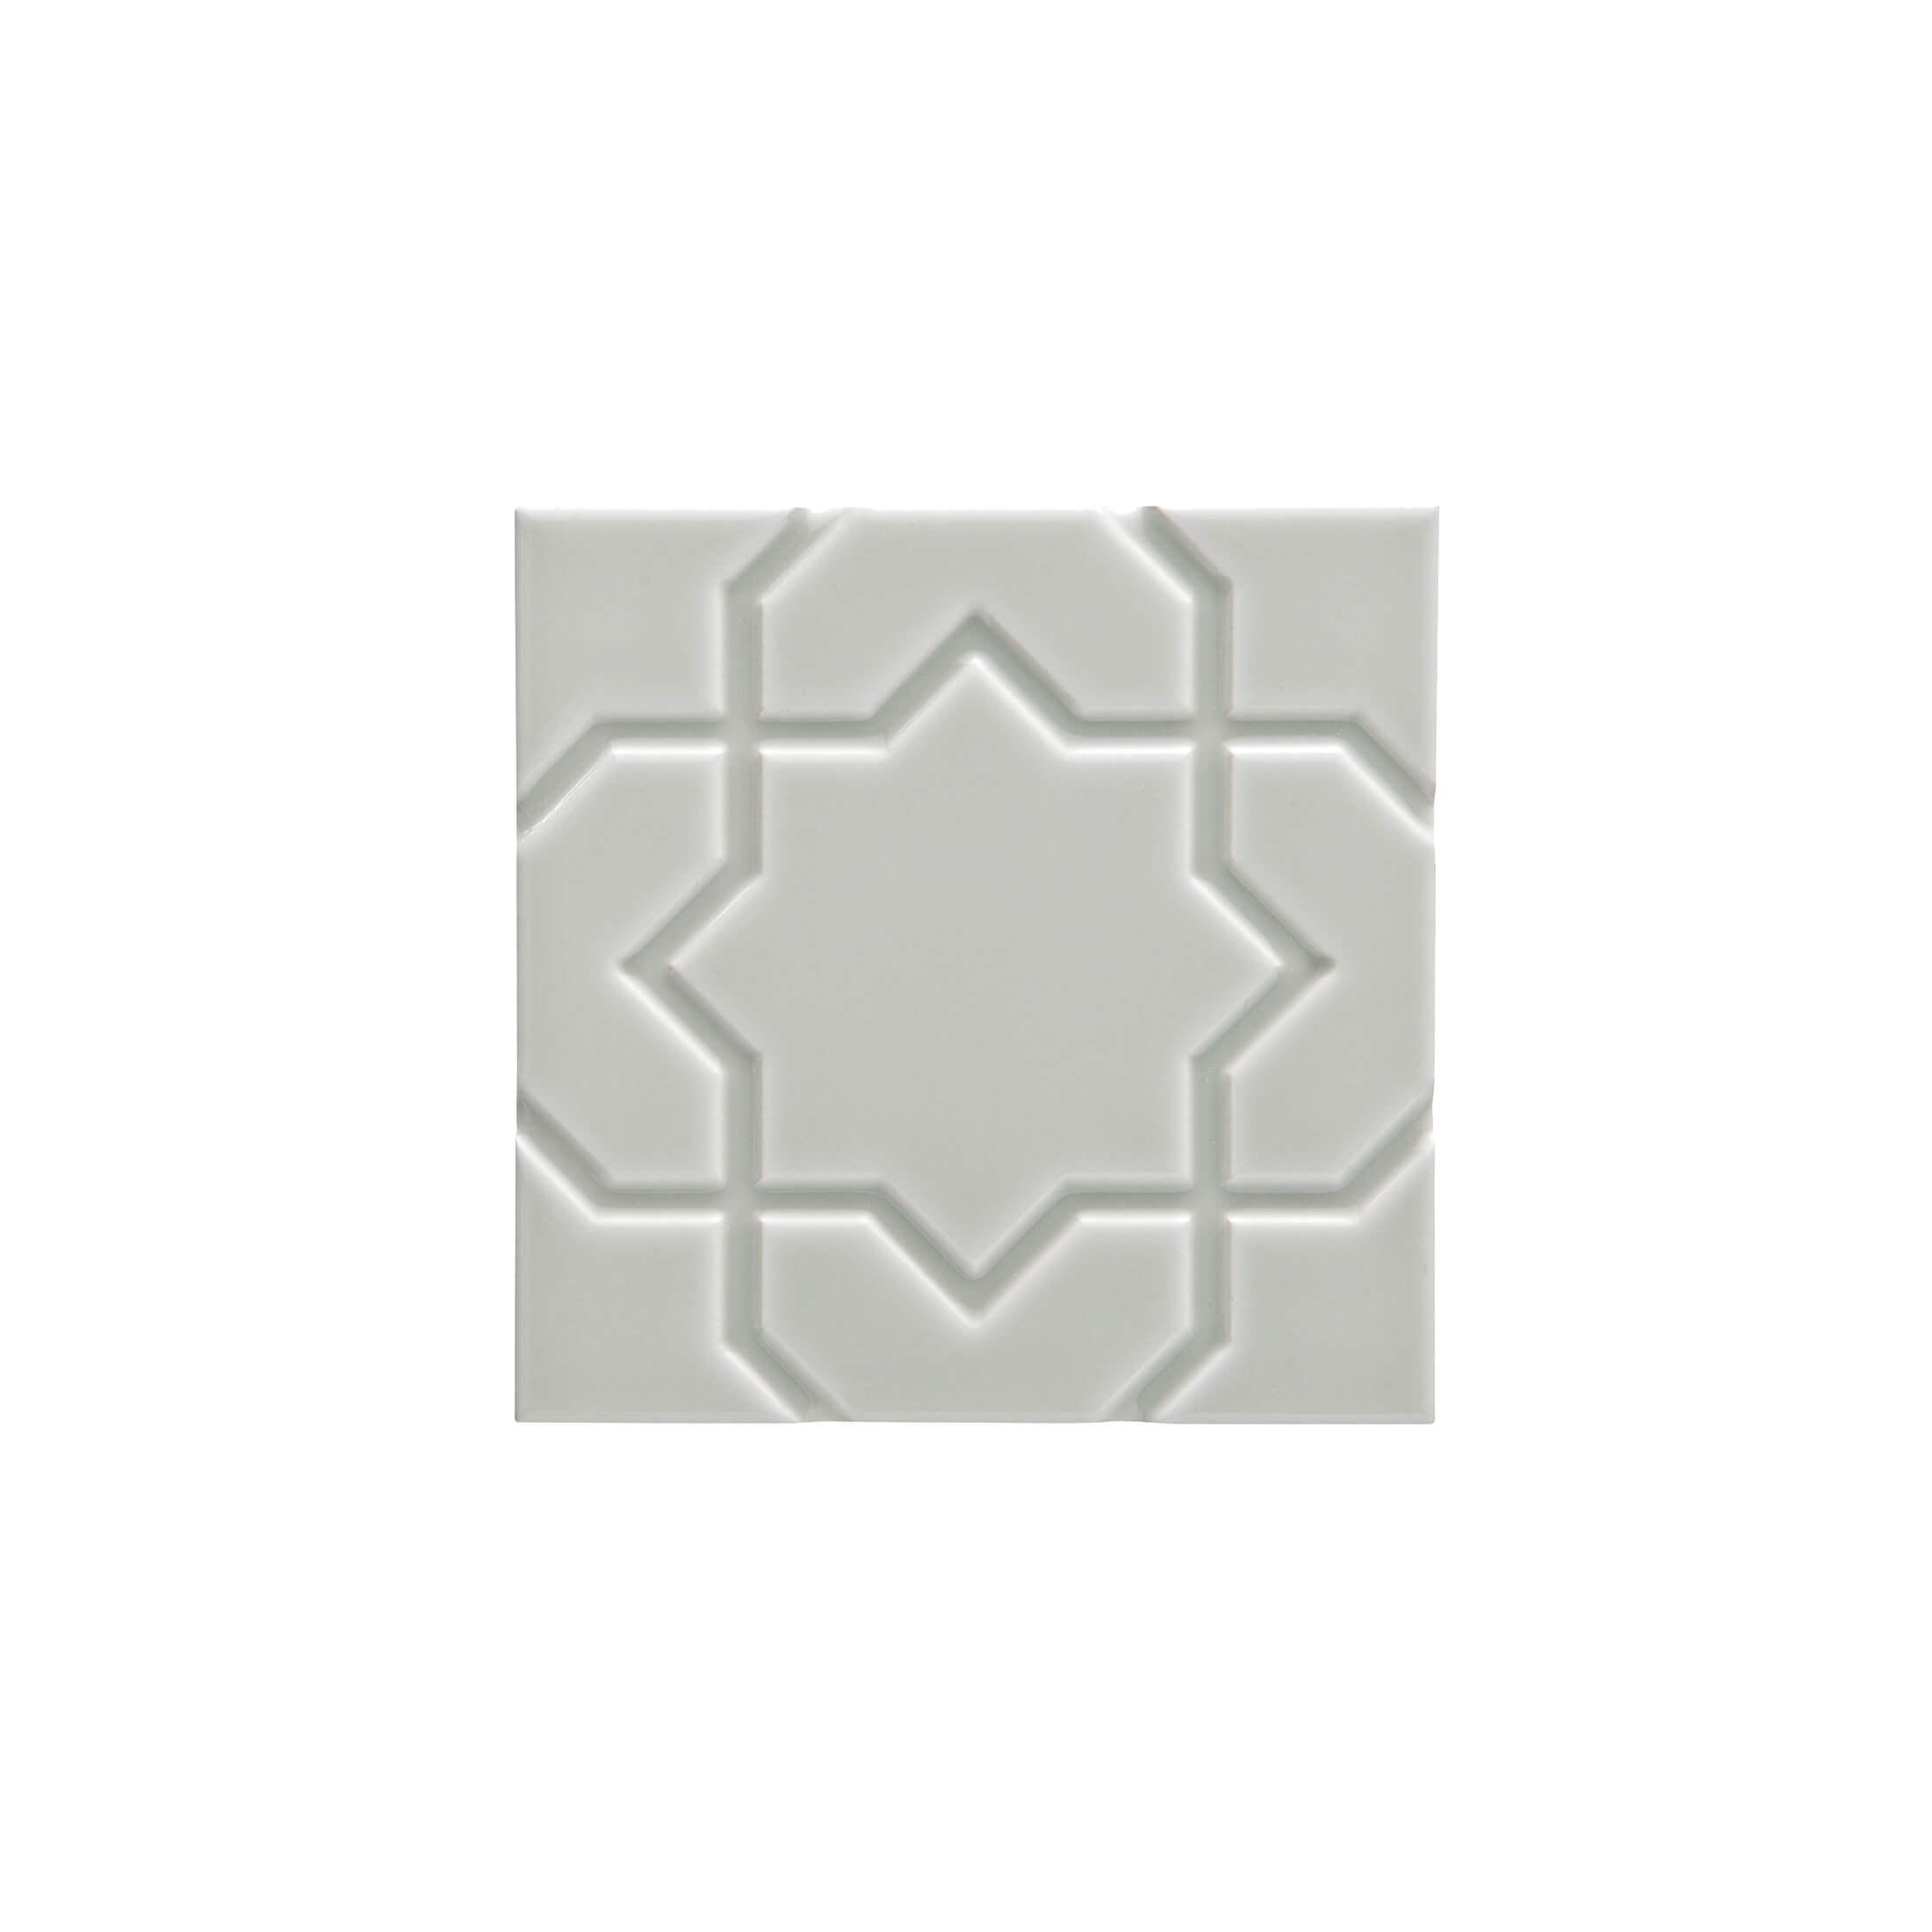 ADNE4153 - LISO STAR - 15 cm X 15 cm